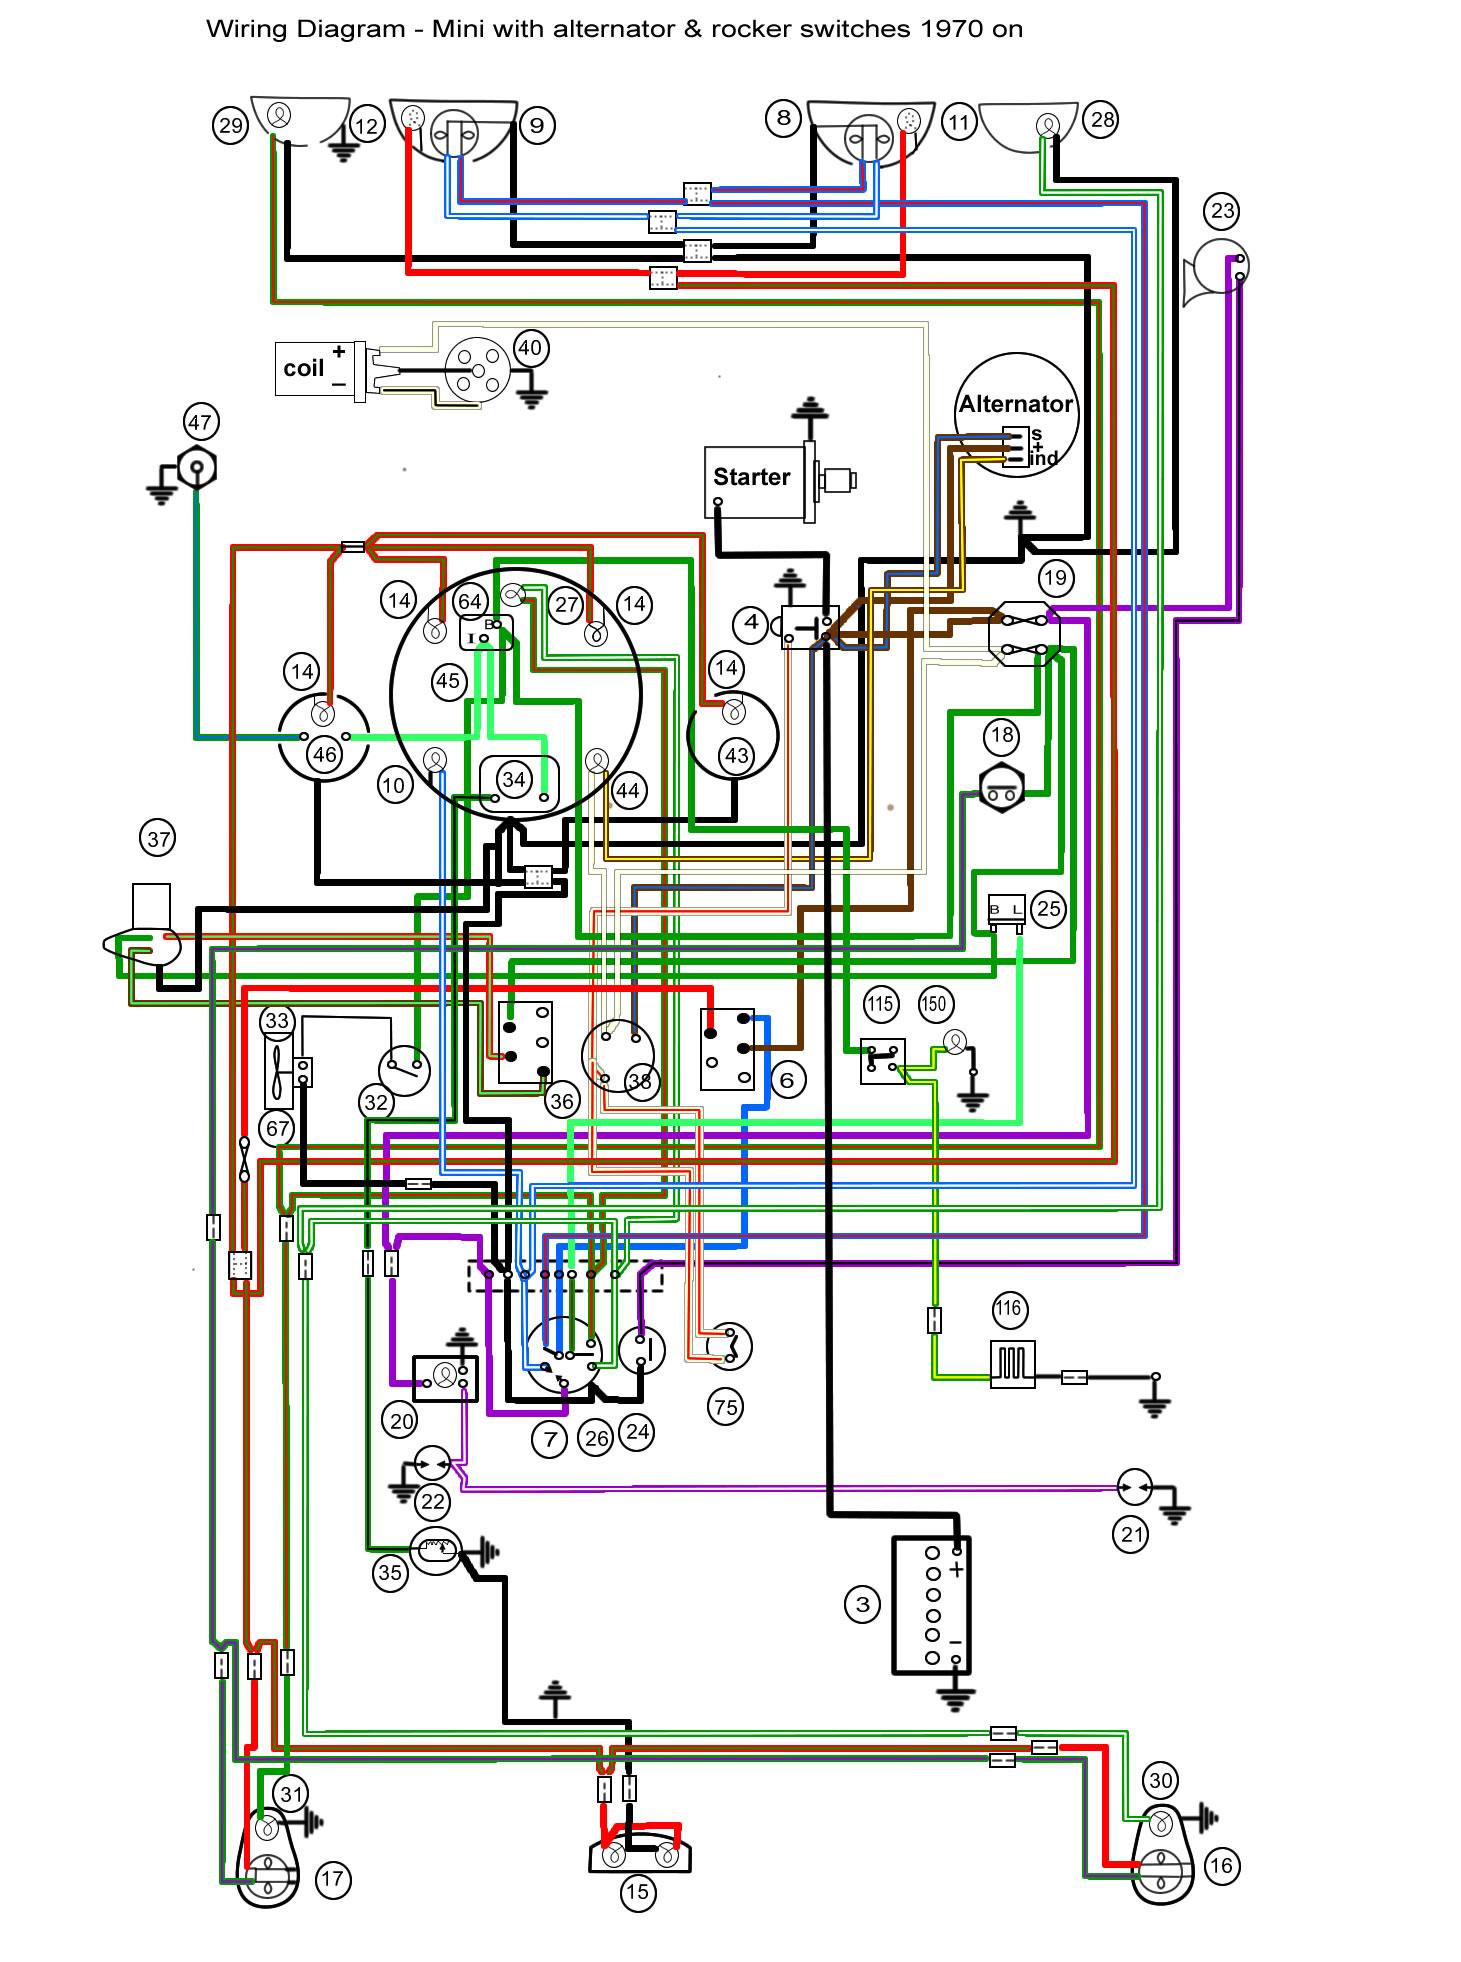 [ZSVE_7041]  Triumph Car Wiring Diagrams - S10 Headlight Wiring Harness Diagram for Wiring  Diagram Schematics | Triumph Car Wiring Diagrams |  | Wiring Diagram Schematics